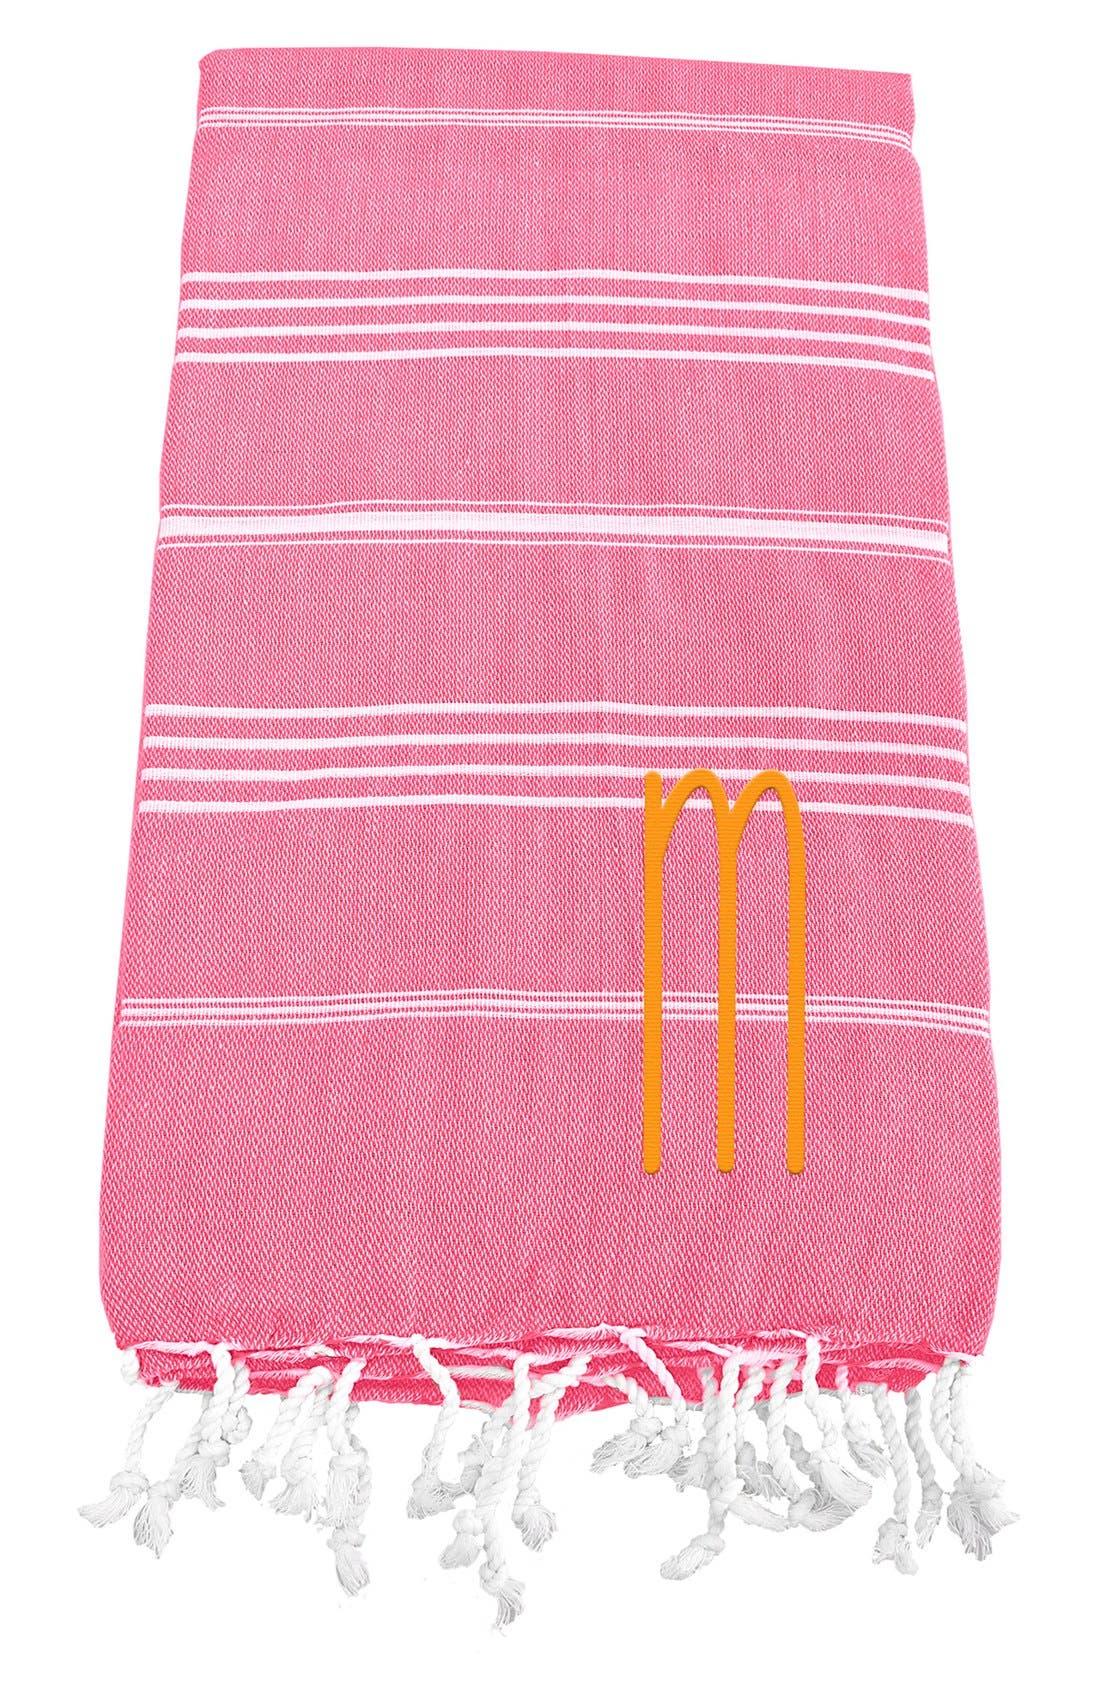 Monogram Turkish Cotton Towel,                             Main thumbnail 149, color,